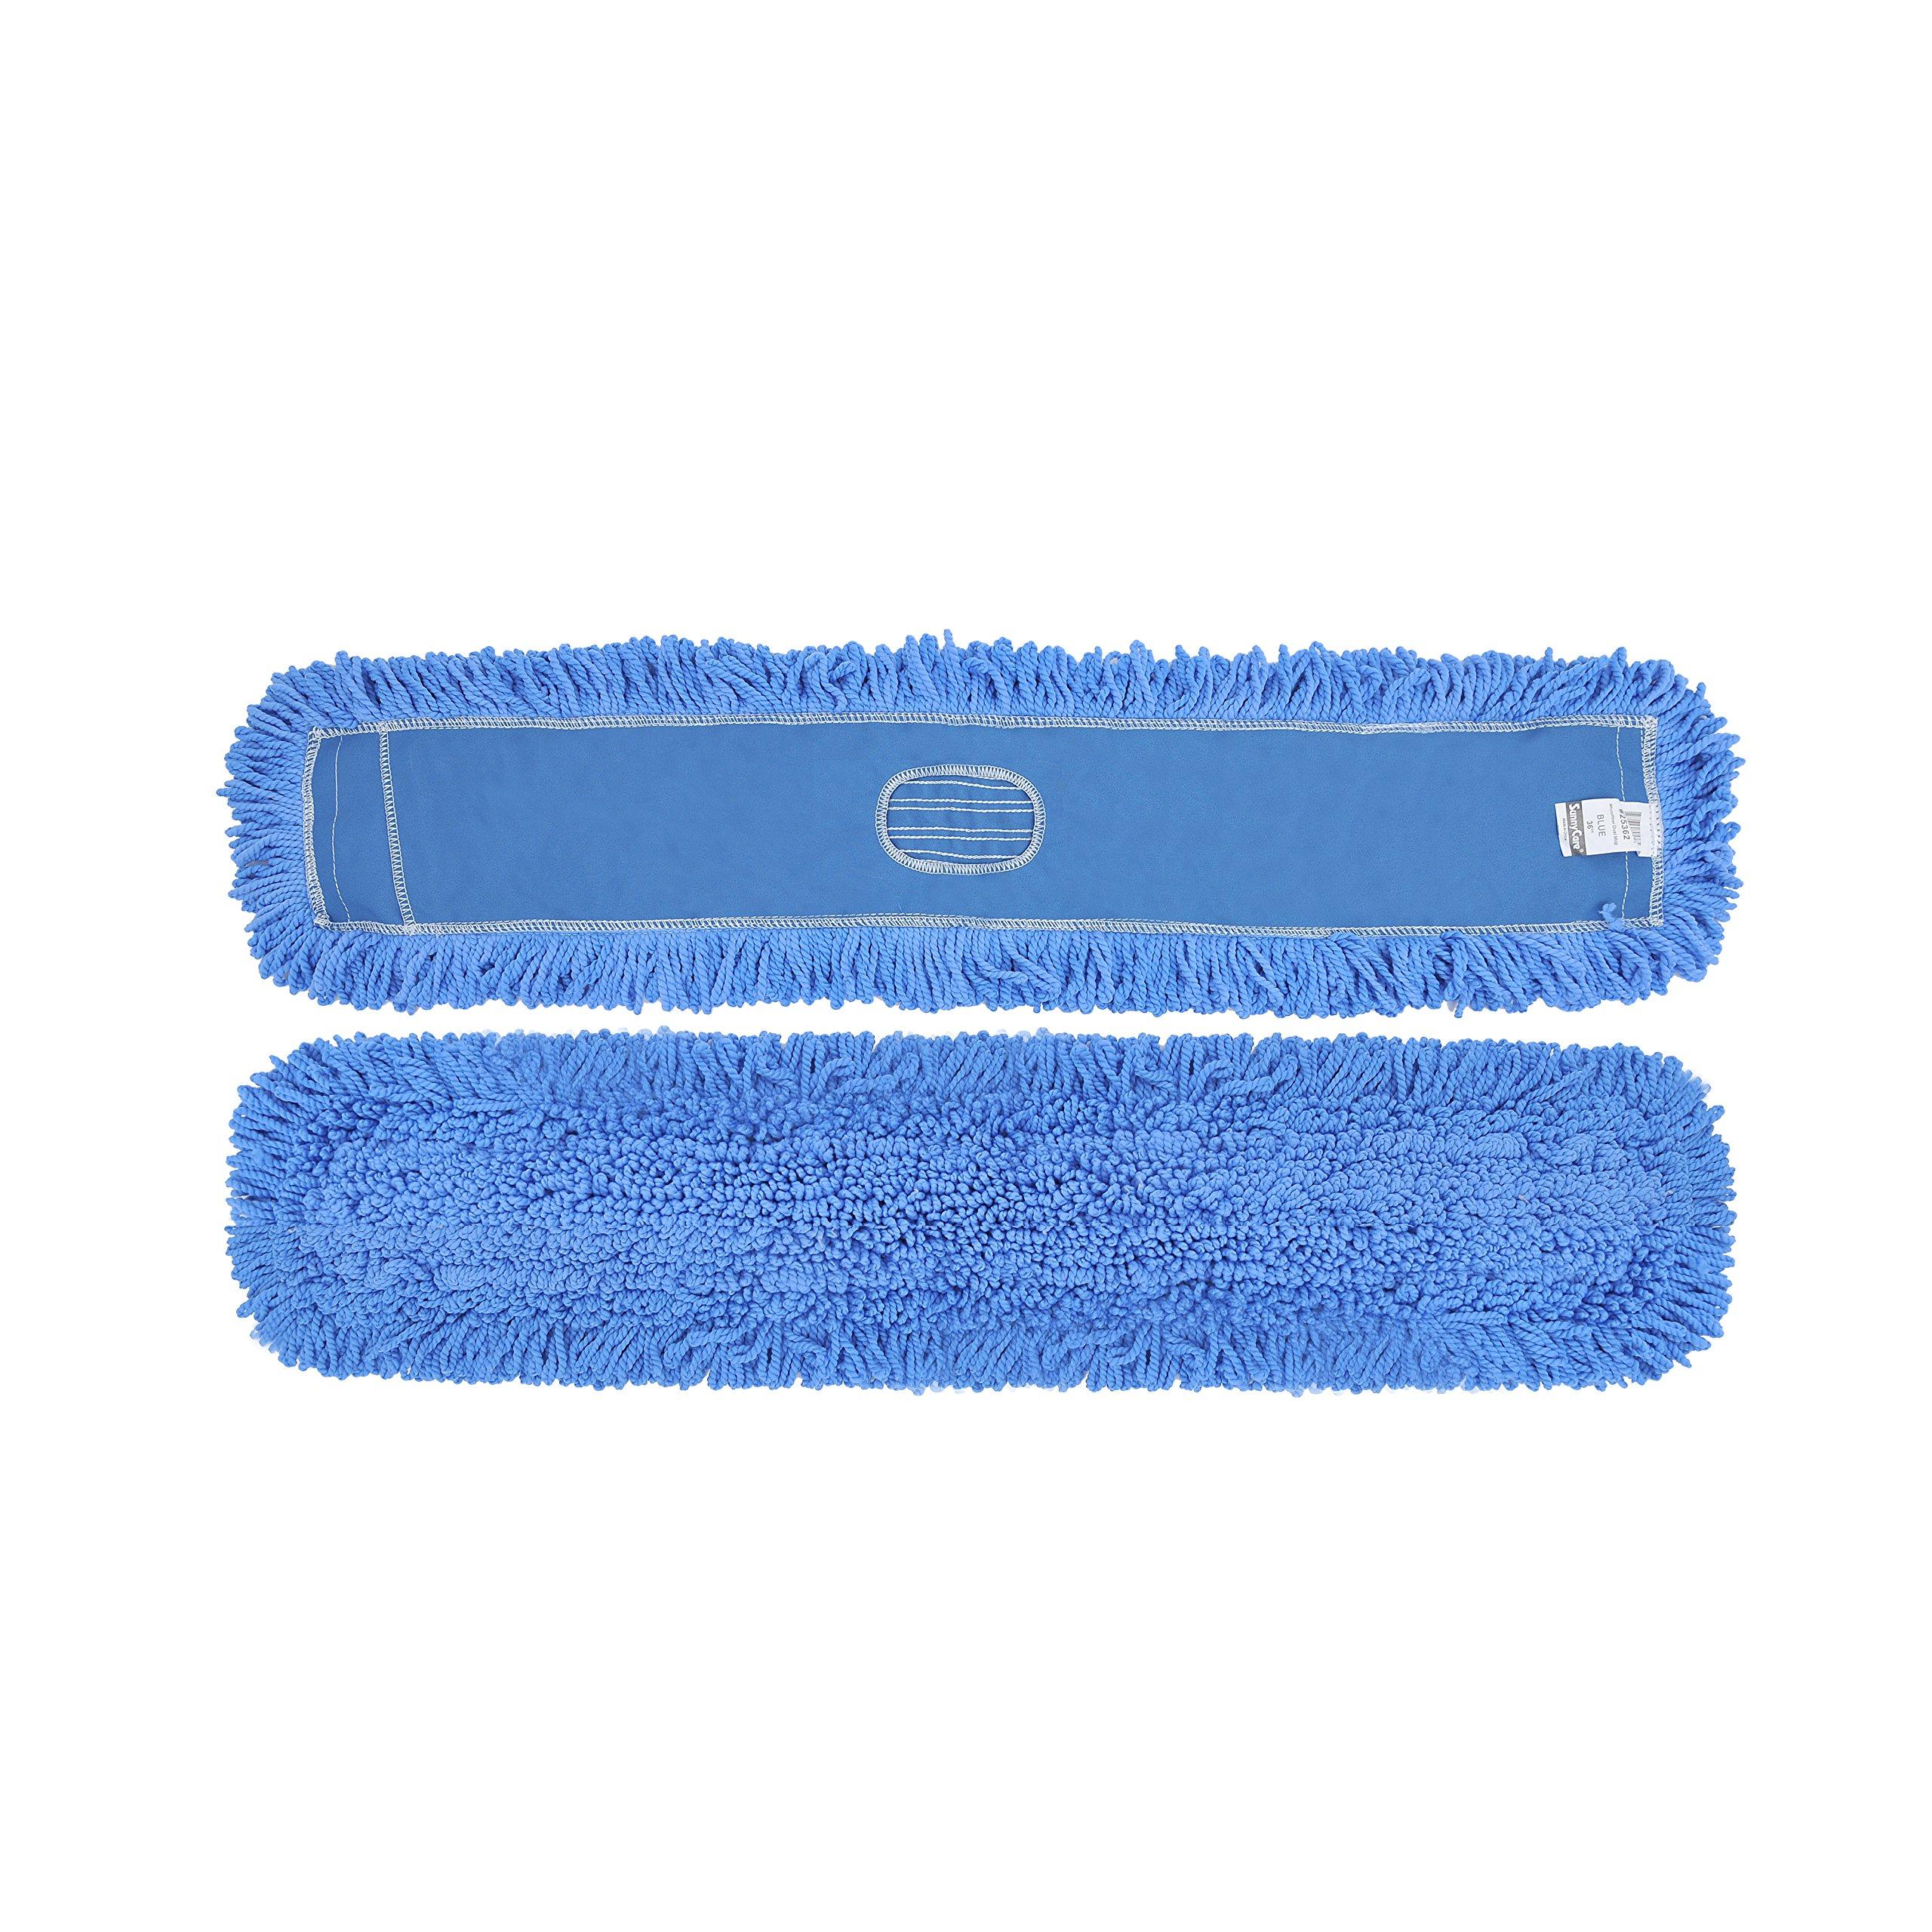 1doz. 48'' x 5'' SunnyCare #25482 Blue Microfiber Dust Mop 12pcs/Case by SunnyCare (Image #1)